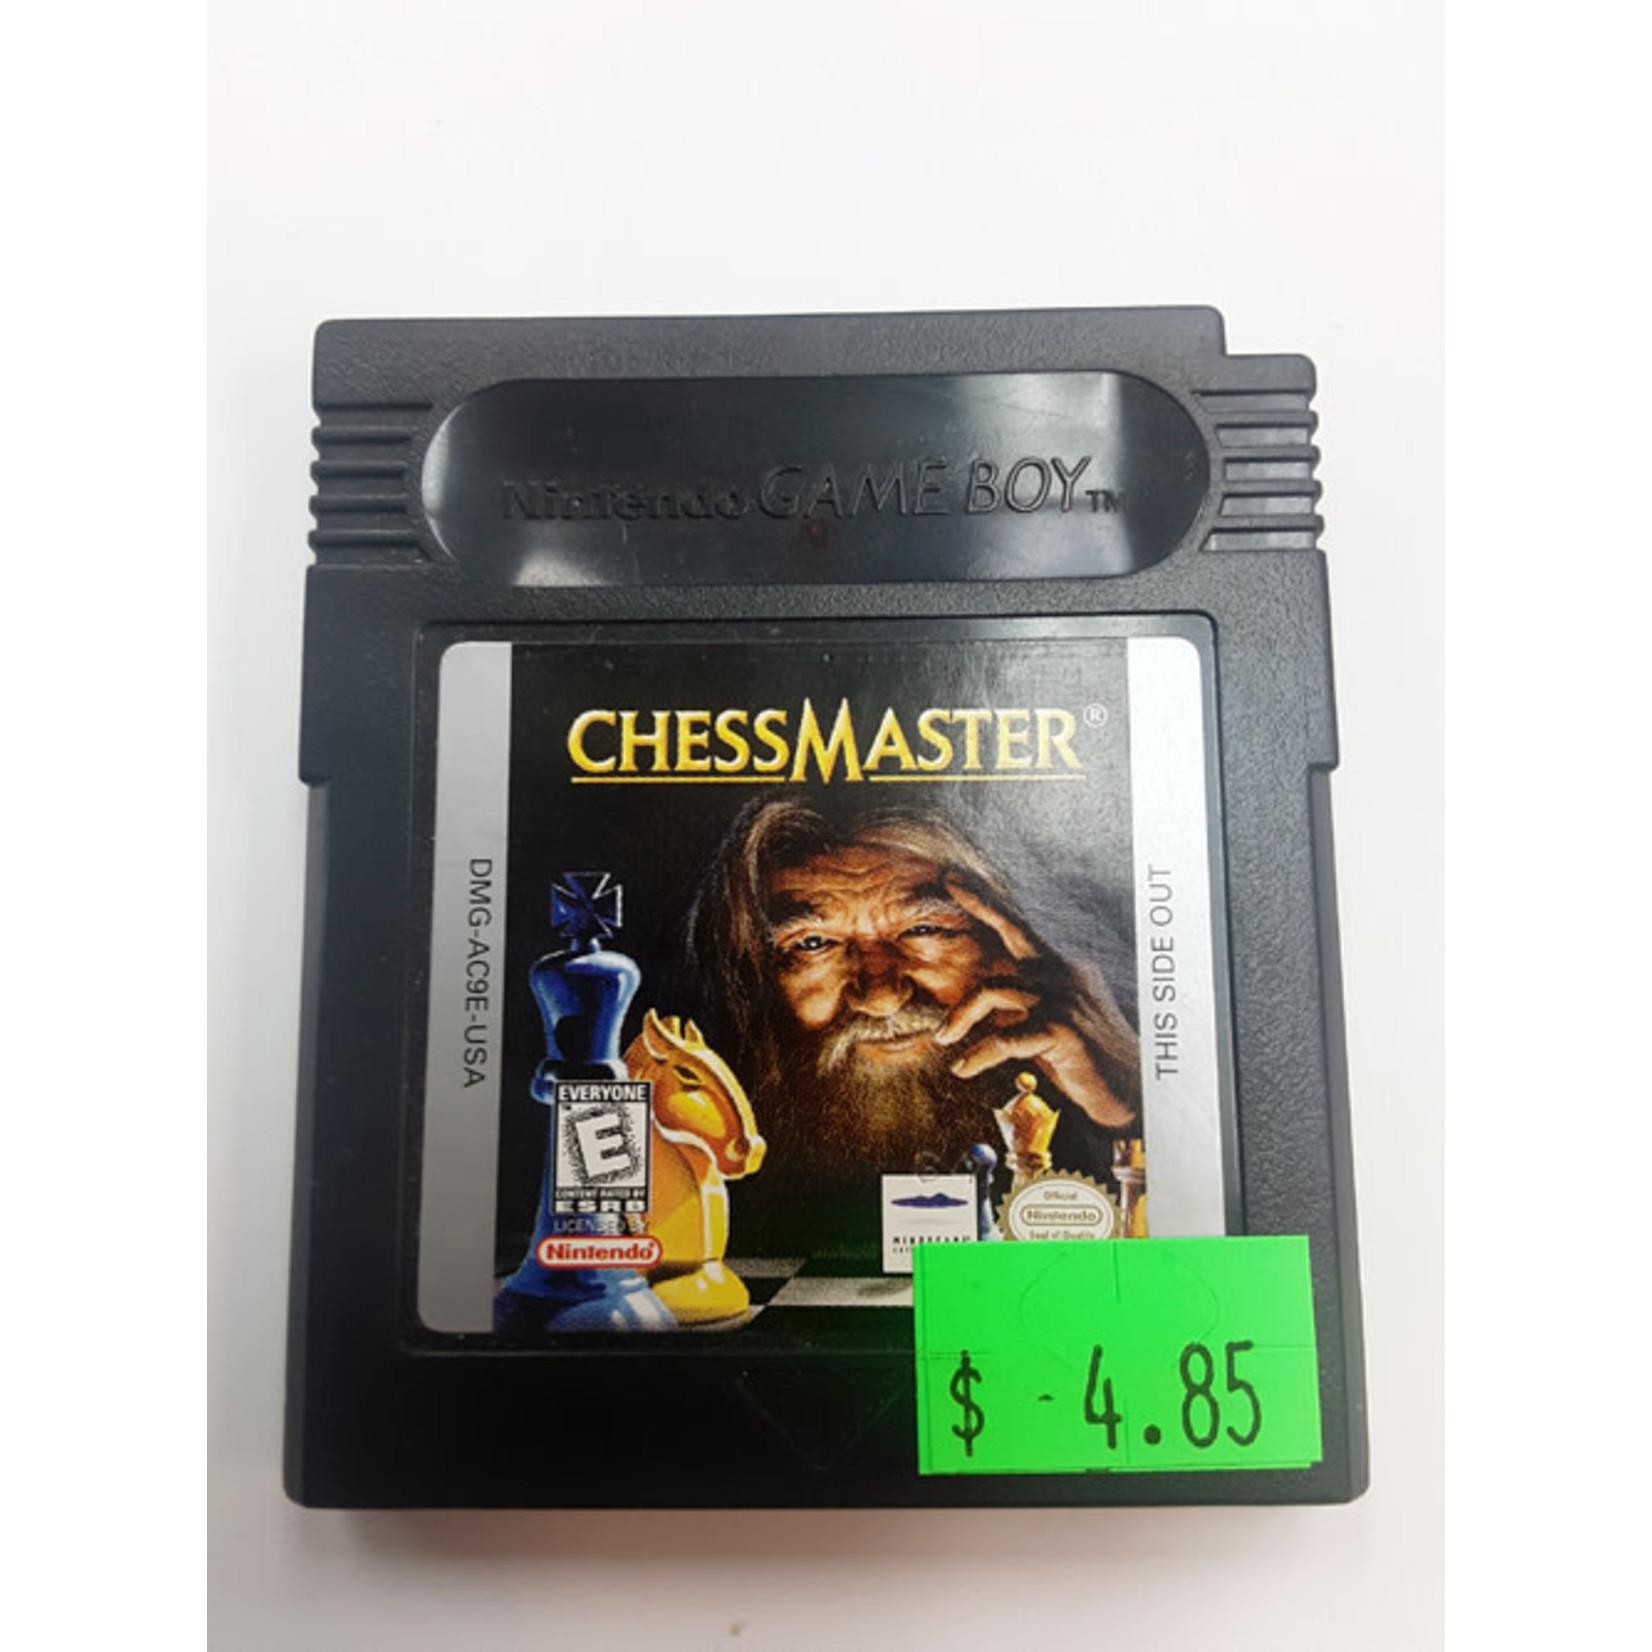 GBCu-Chess Master (cartridge)